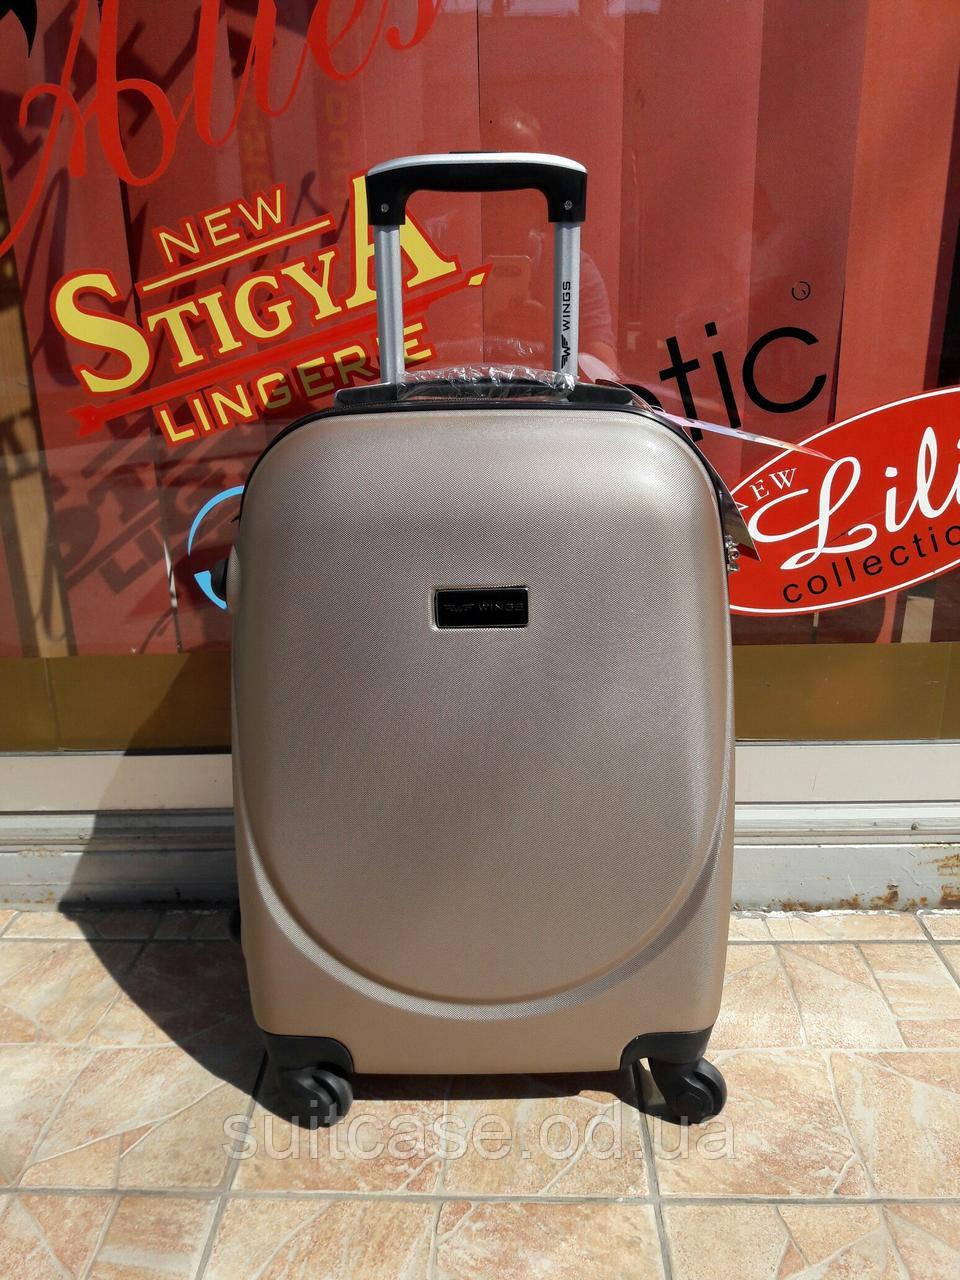 8db966d2ac8e Малый пластиковый чемодан на четырёх колёсах WINGS - Интернет-магазин